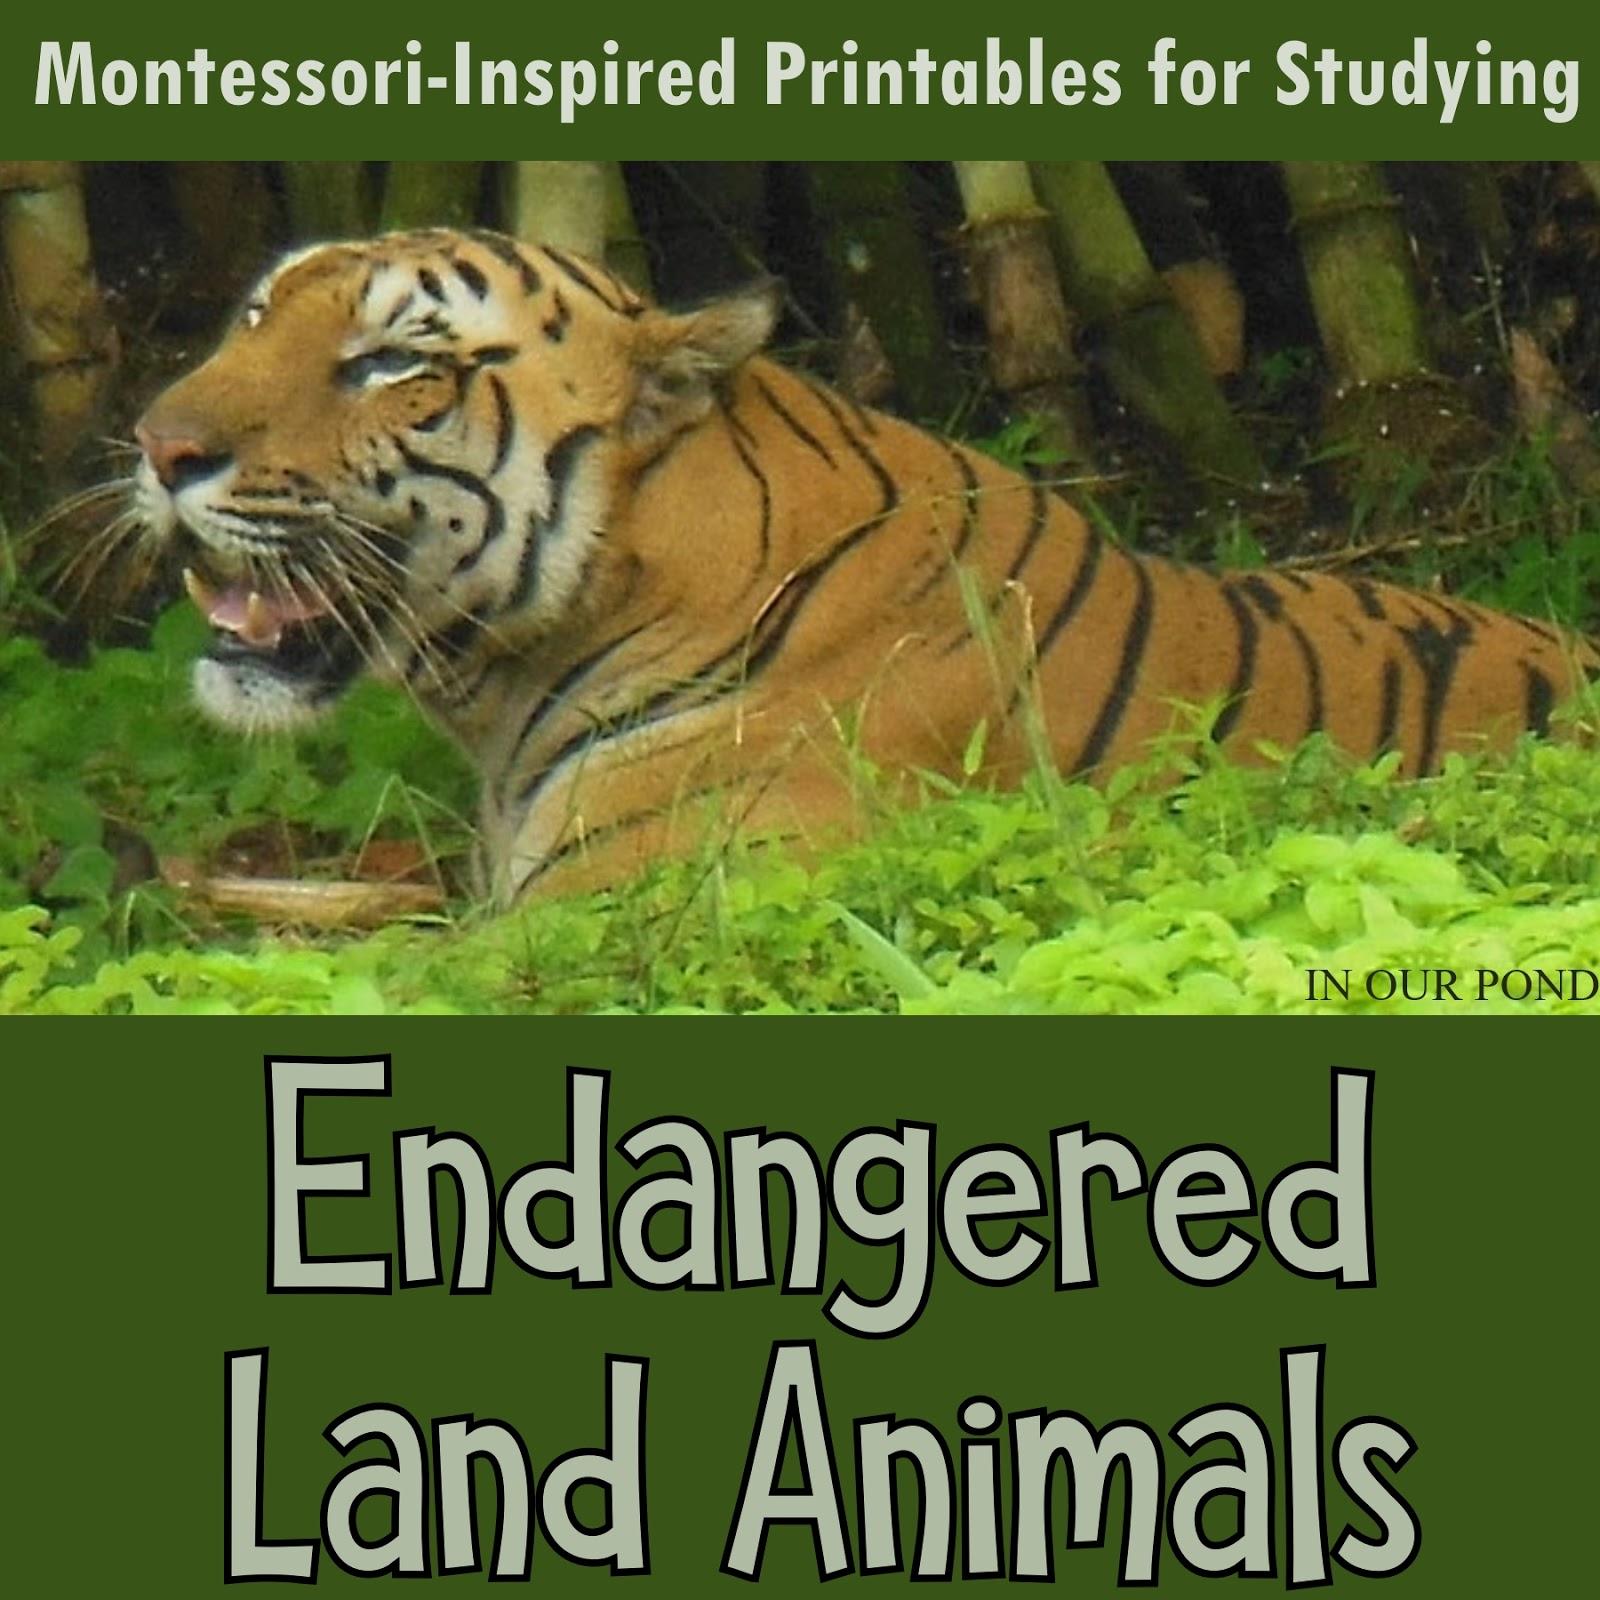 Endangered Land Animals 3 Part Cards